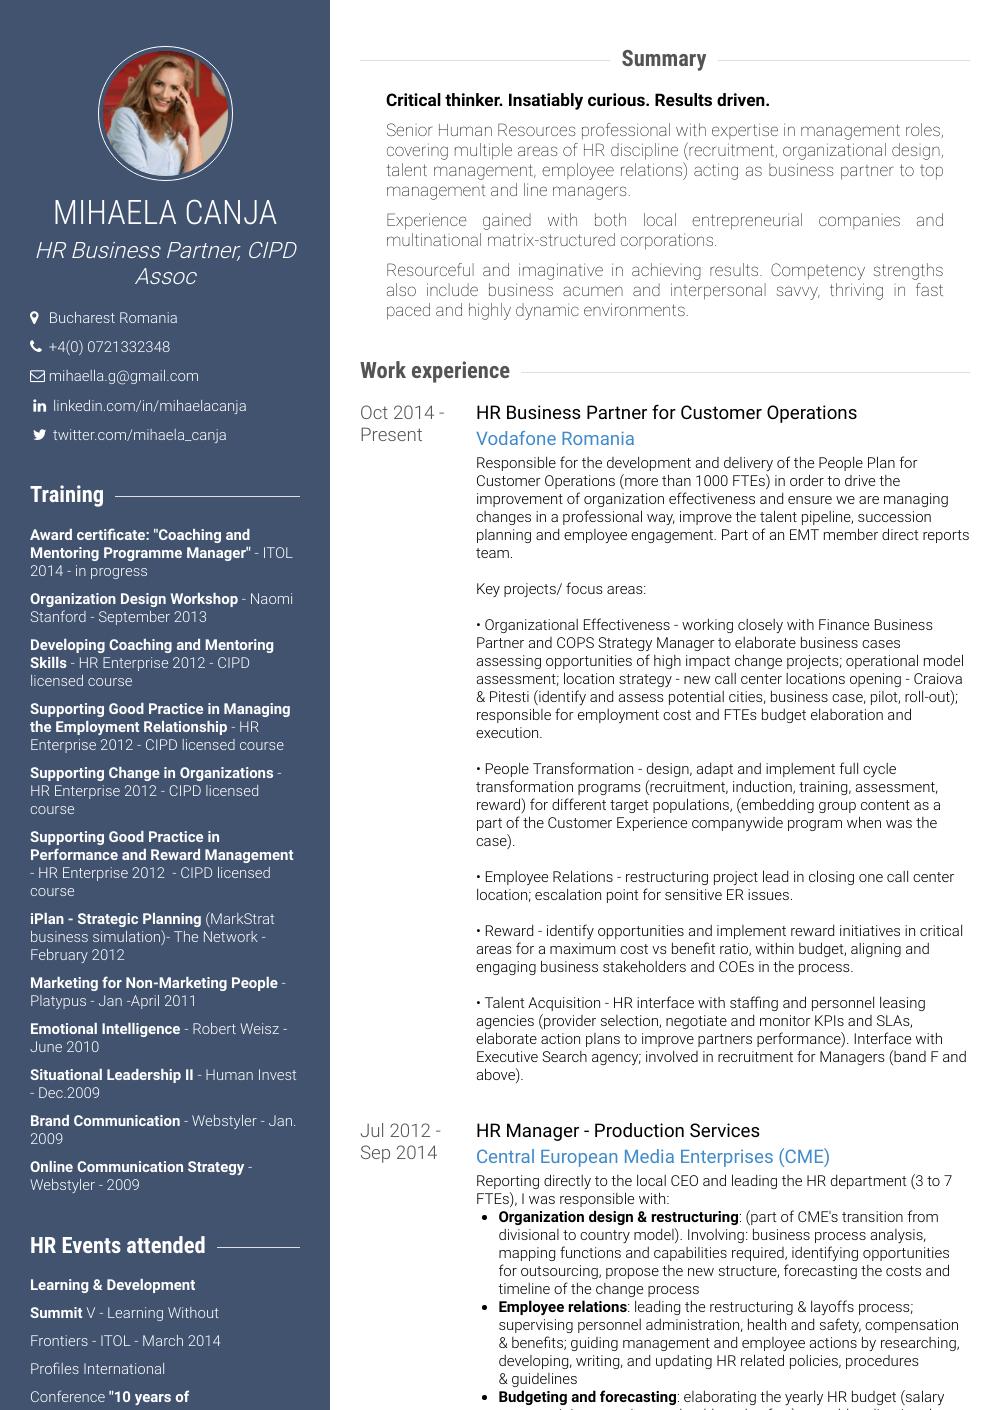 Business Partner Resume Samples & Templates VisualCV